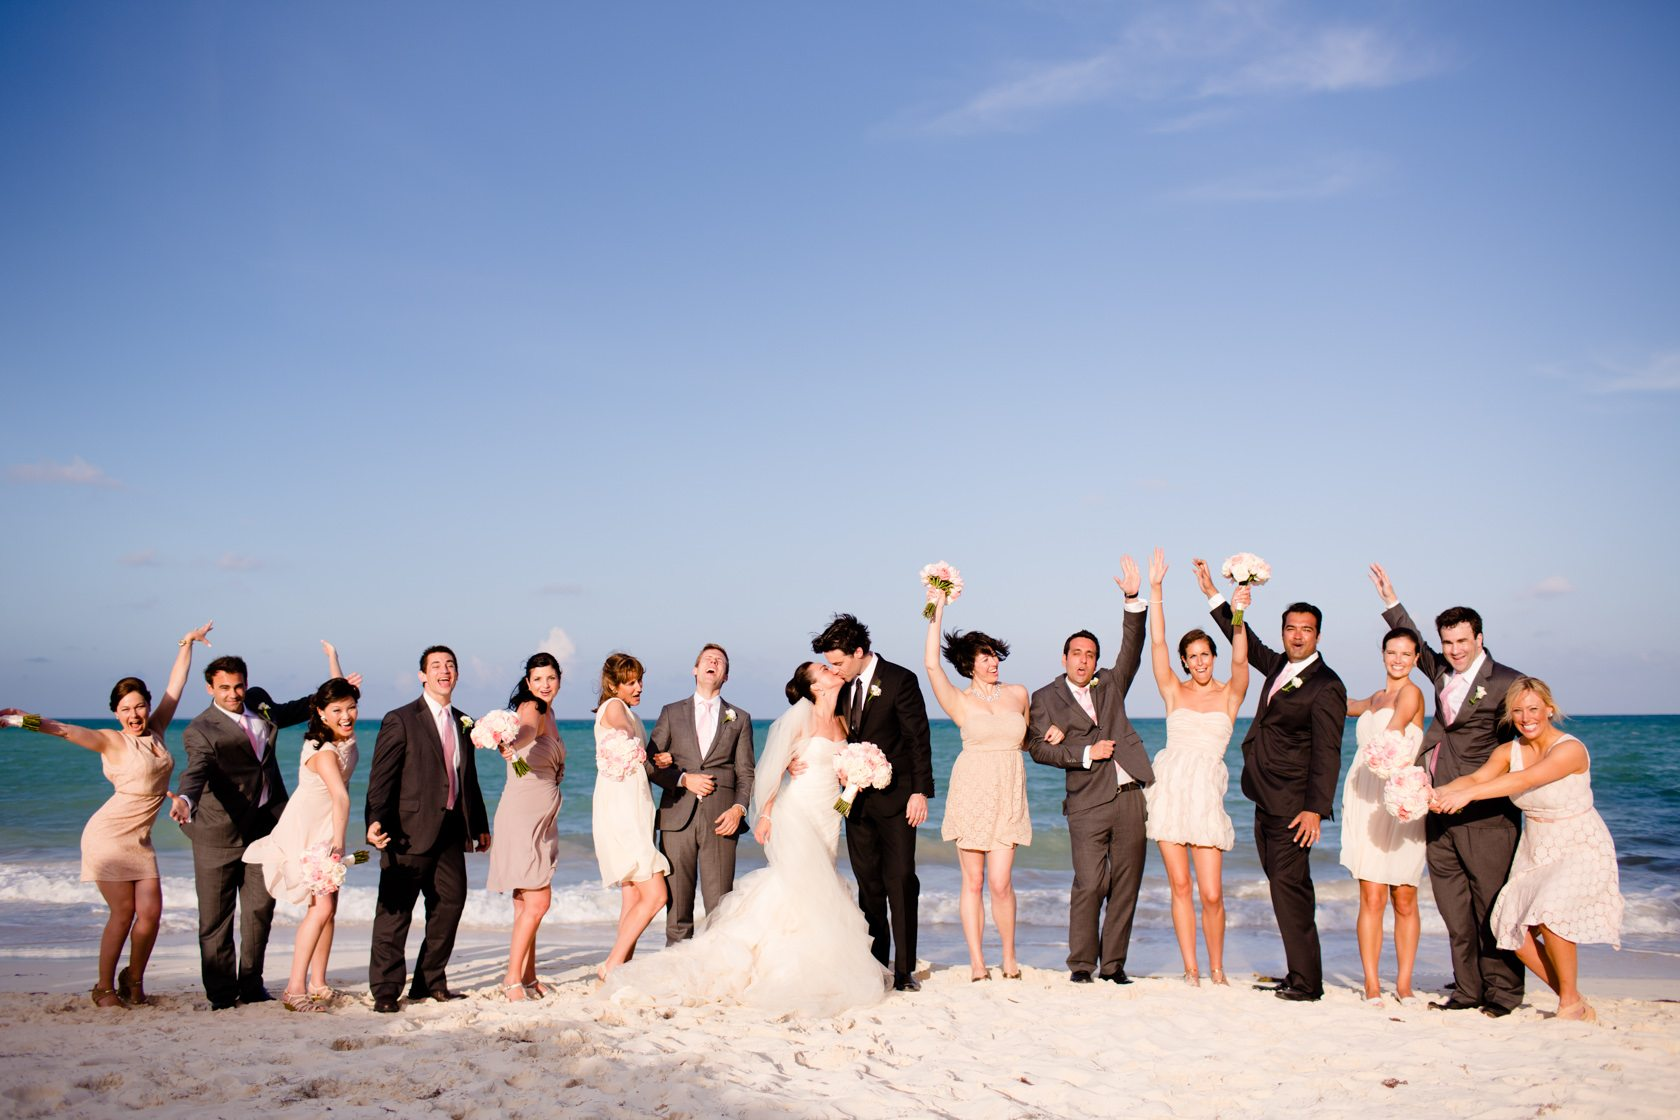 Fairmont_Mayakoba_Wedding_063.jpg